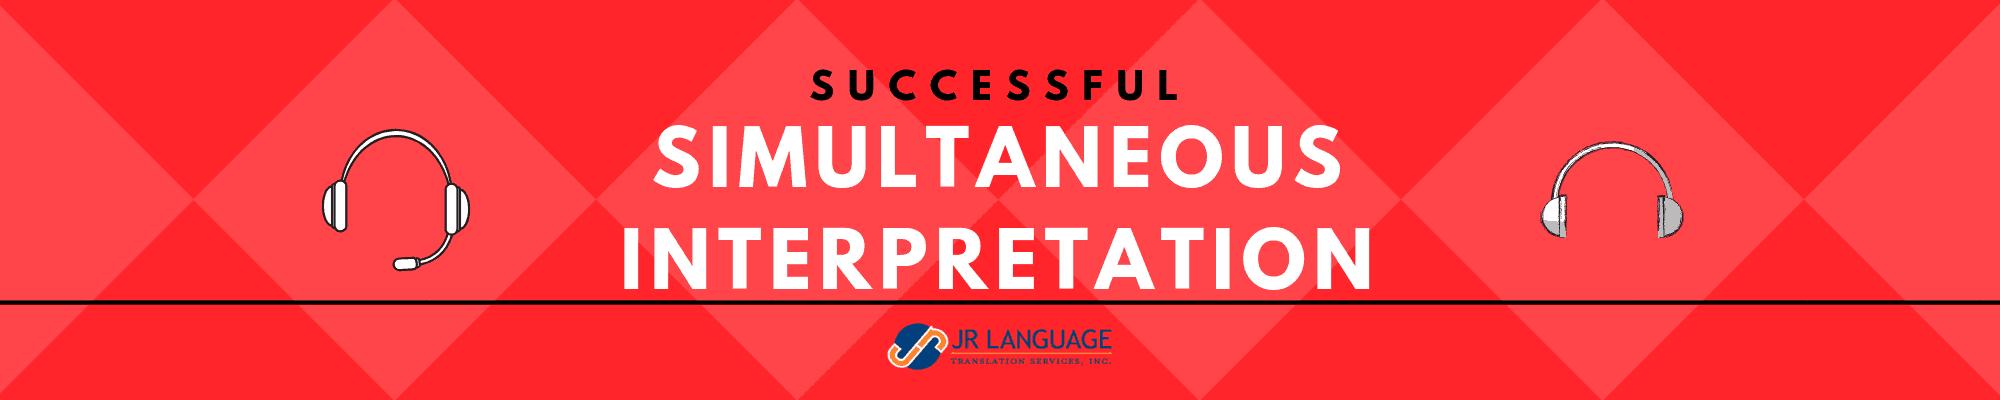 Tips for successful simultaneous interpretation